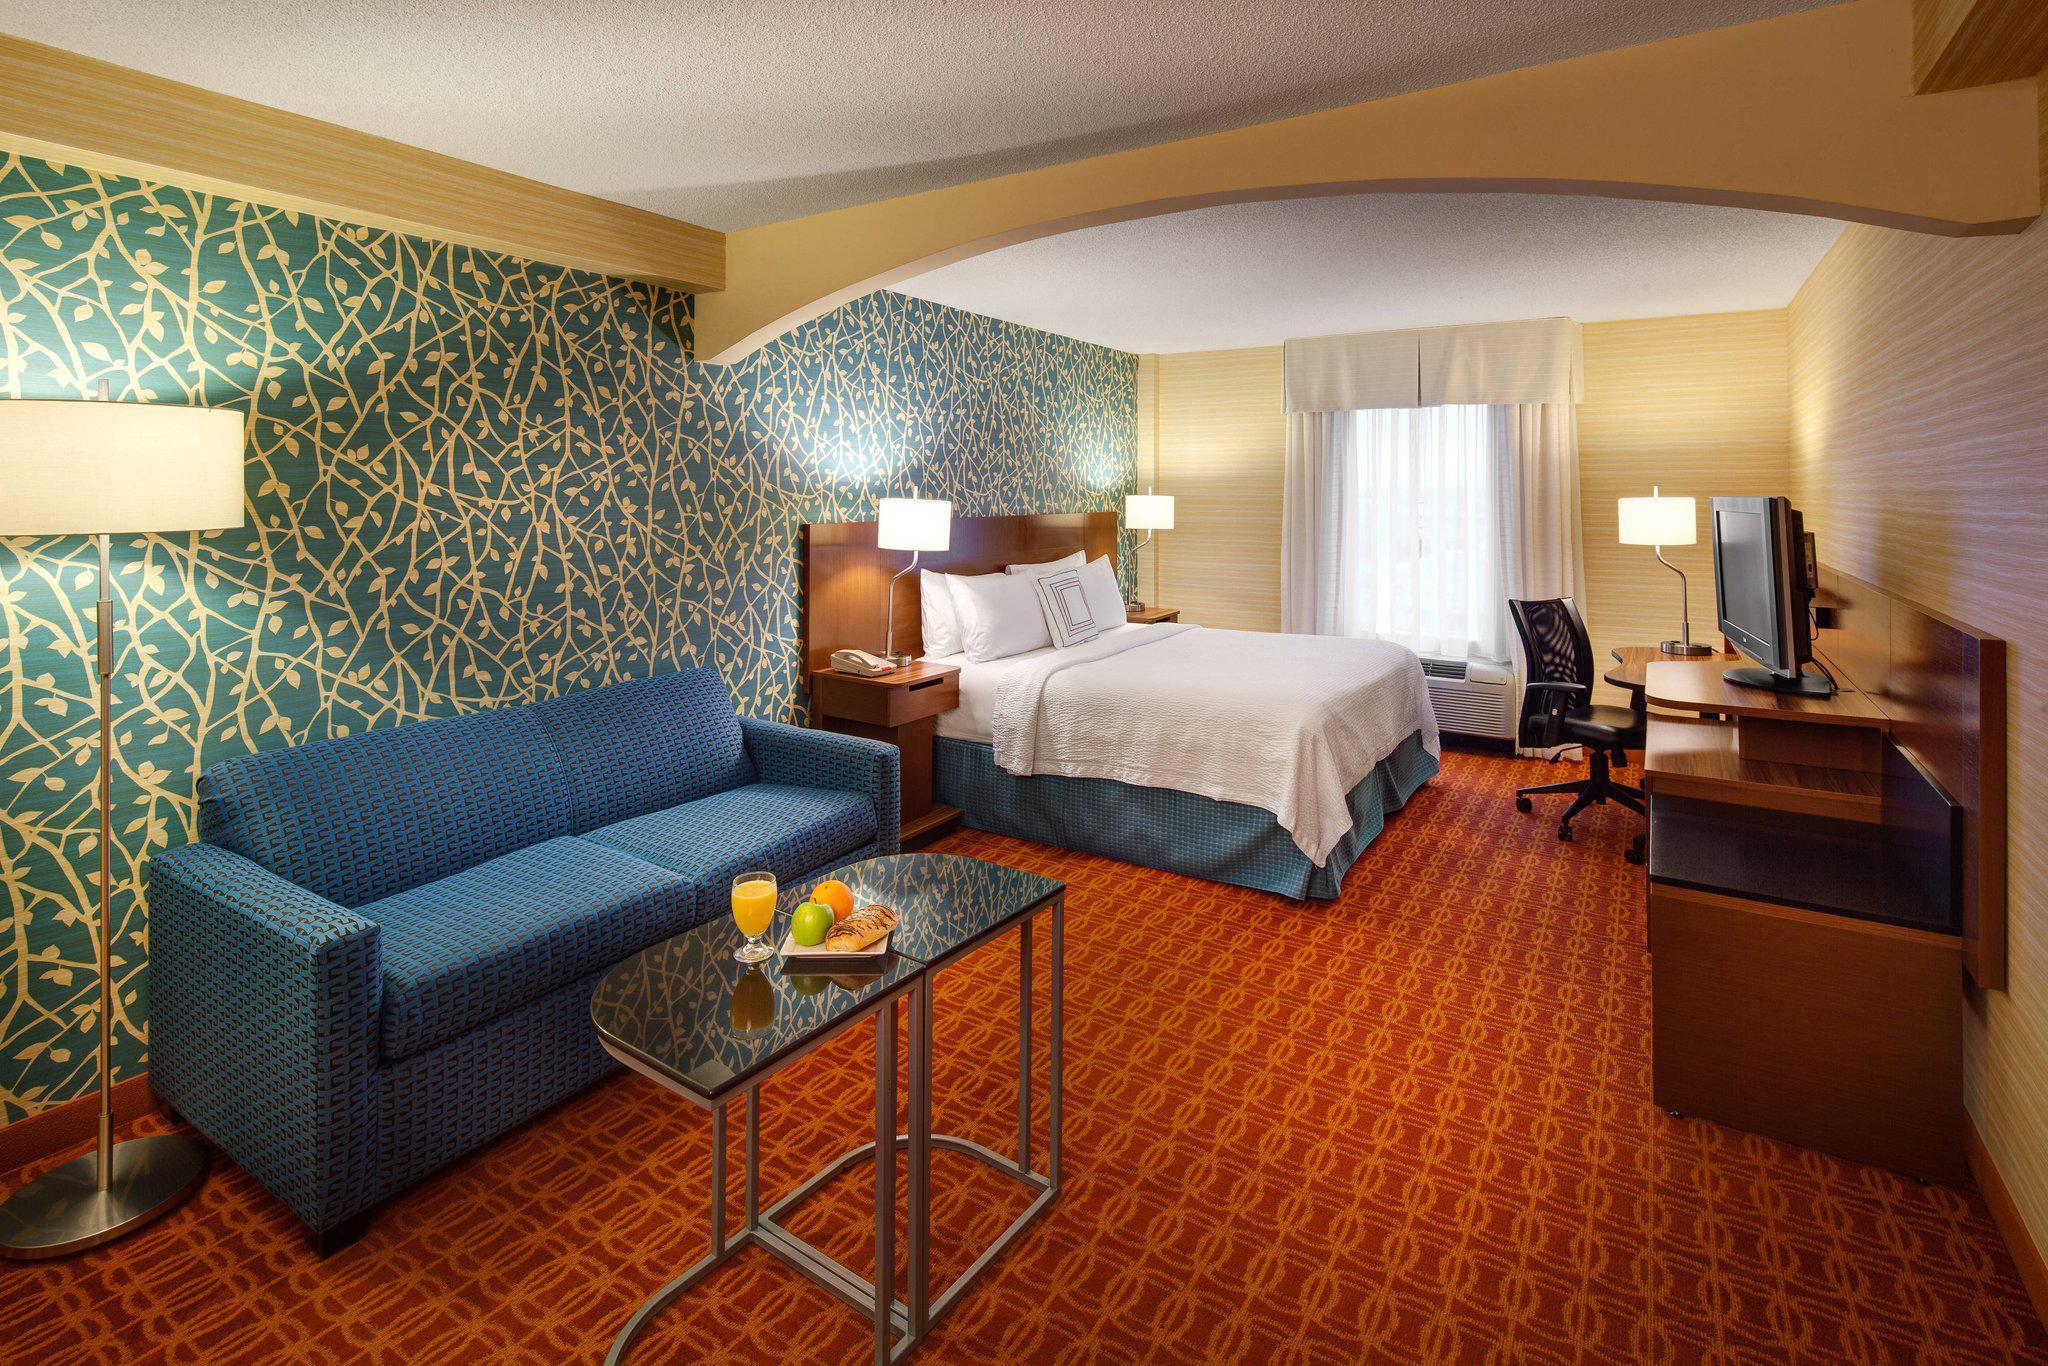 Fairfield Inn & Suites by Marriott Toronto Airport